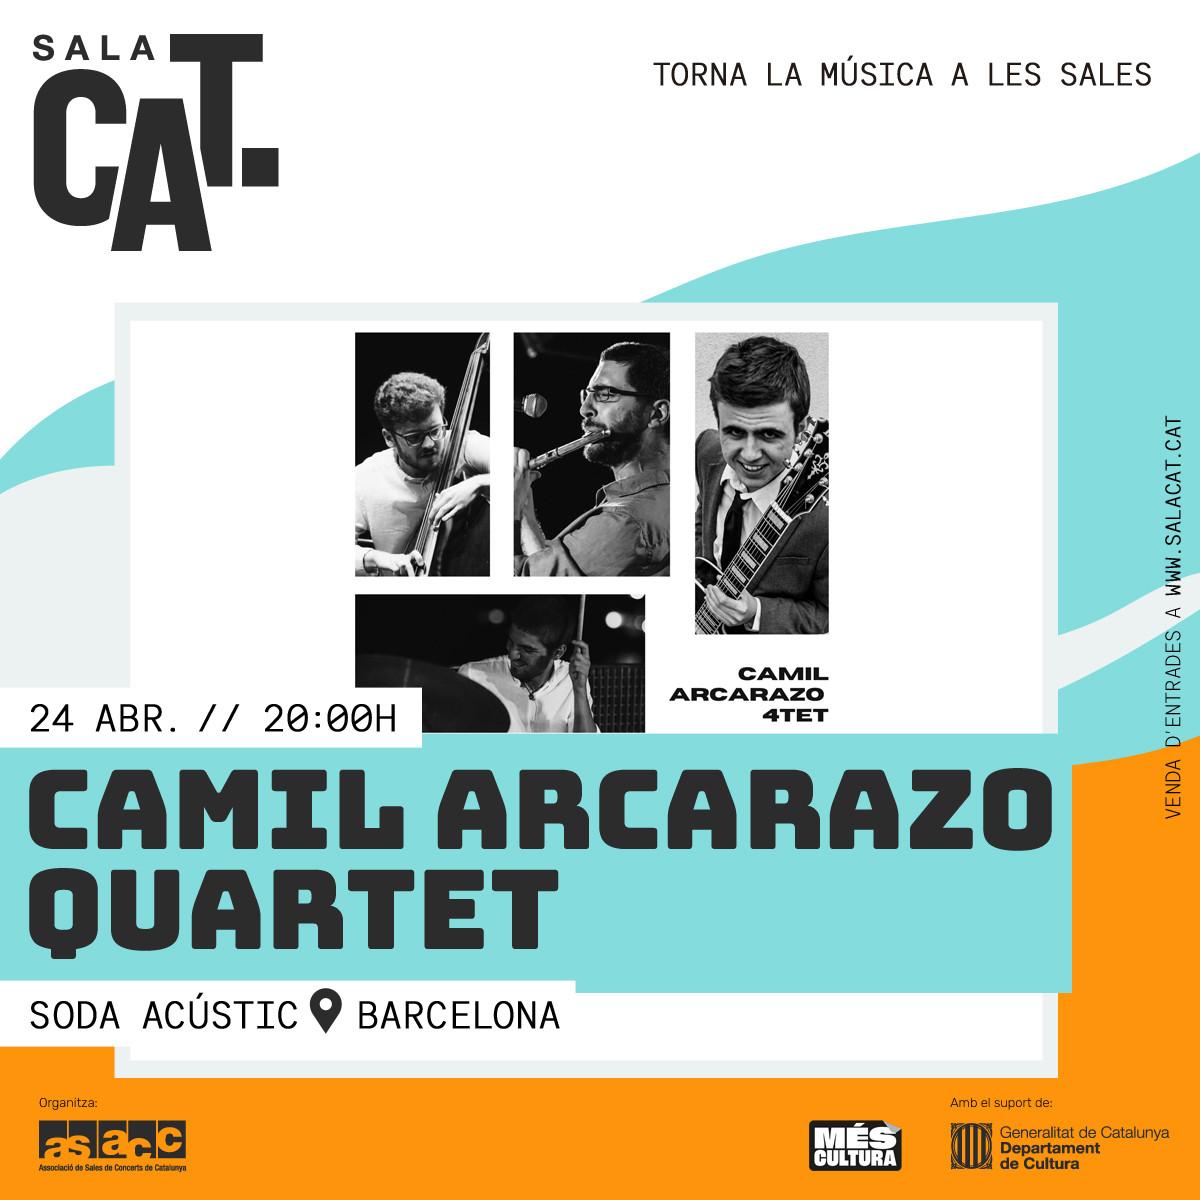 Camil Arcarazo-Soda-IG